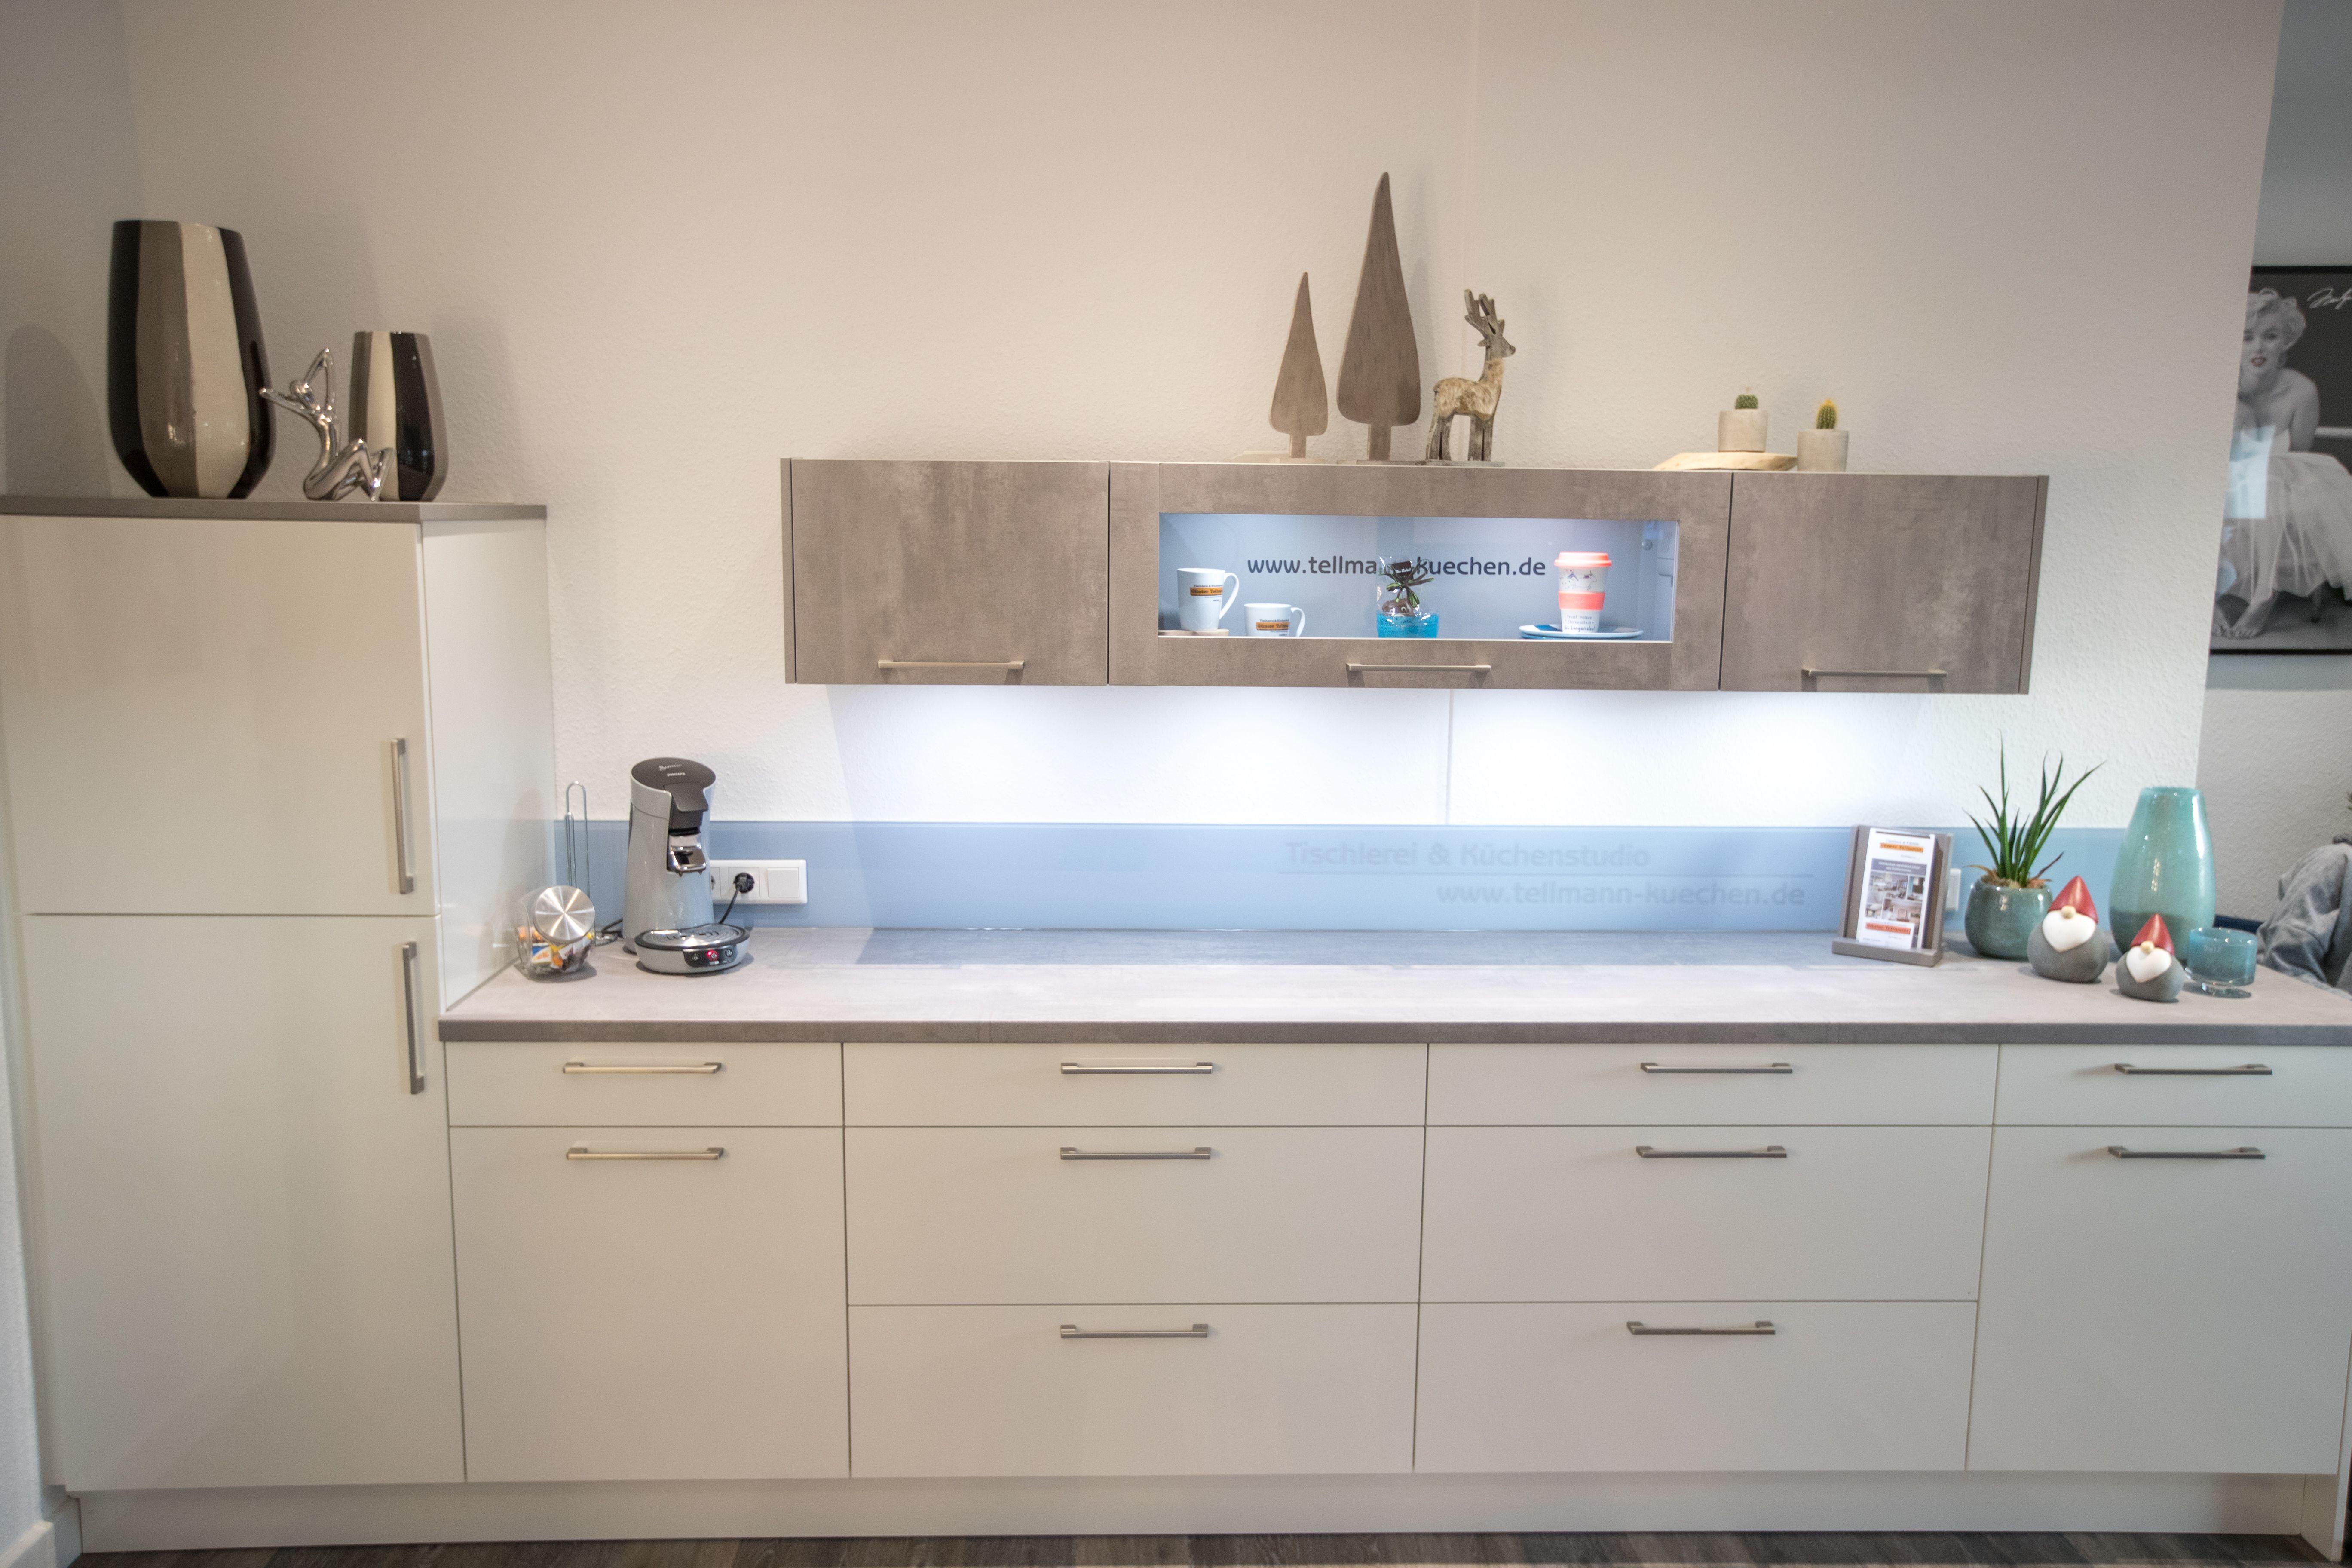 Kuchenstudio Tellmann Kuechentellmann Auf Pinterest